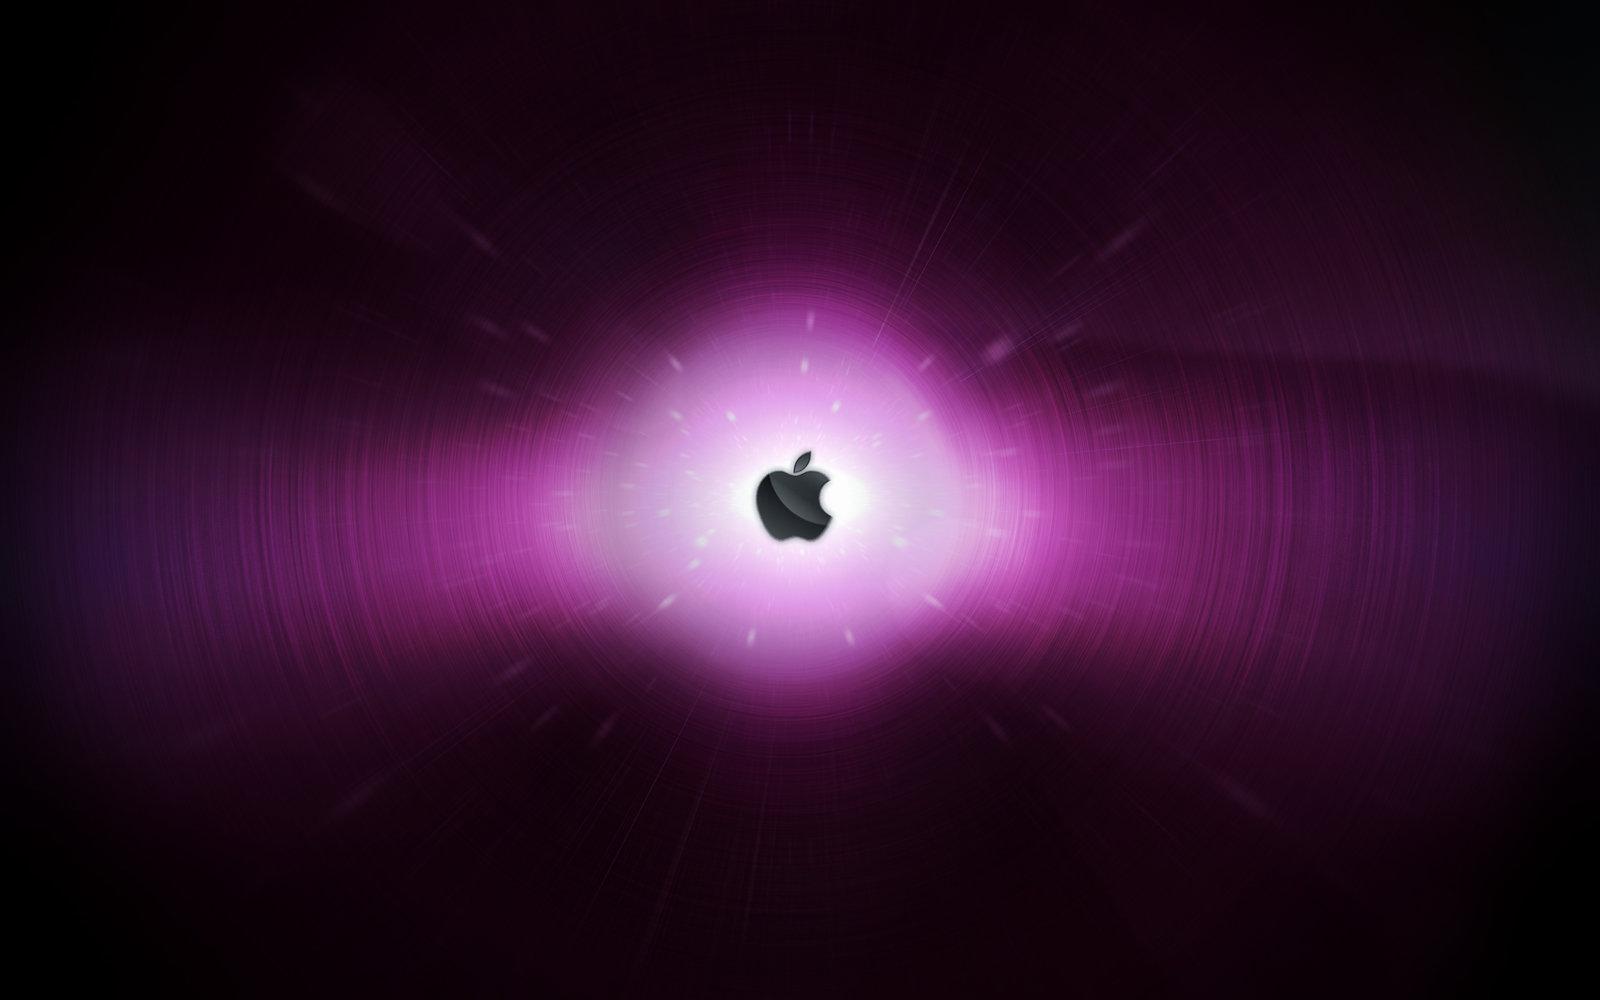 Mac Os X Leopard Background